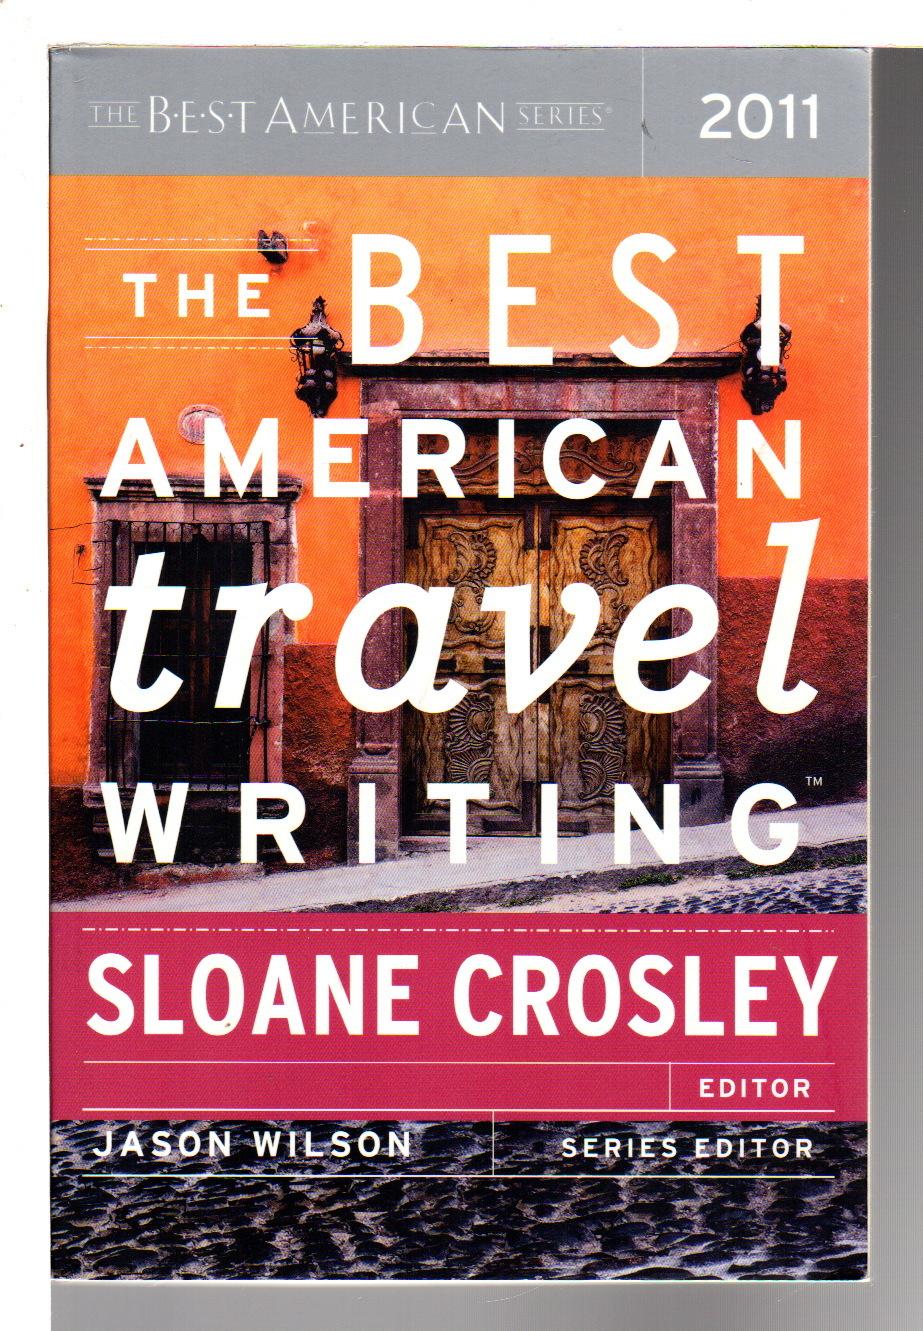 CROSLEY, SLOANE, EDITOR;  JASON WILSON, SERIES EDITOR. - THE BEST AMERICAN TRAVEL WRITING 2011.